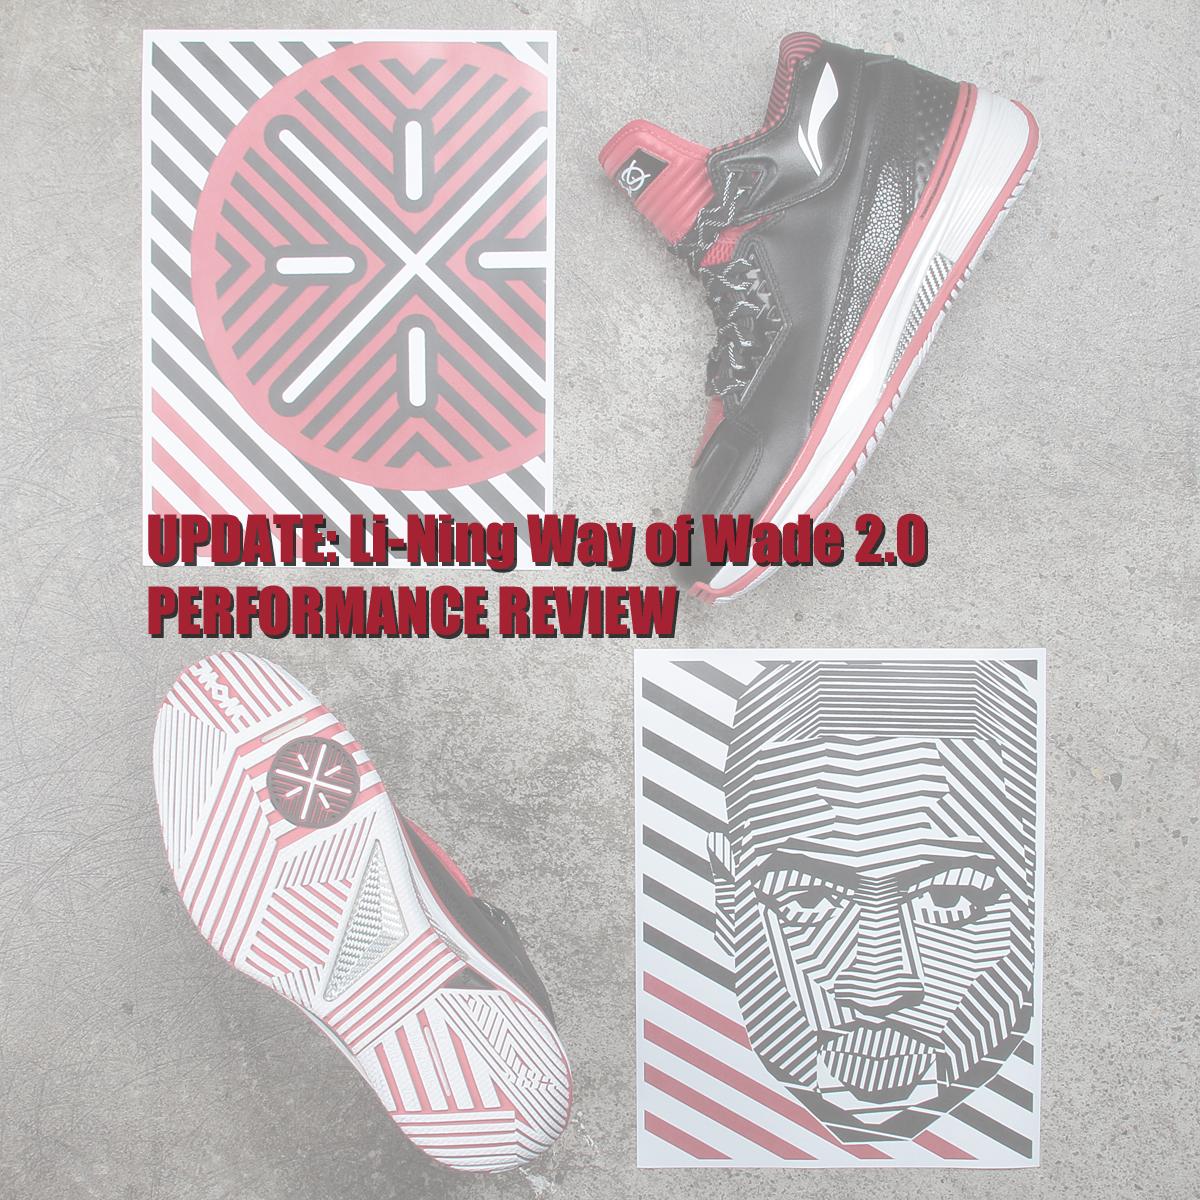 Li-Ning Way of Wade 2.0 Performance Review Update